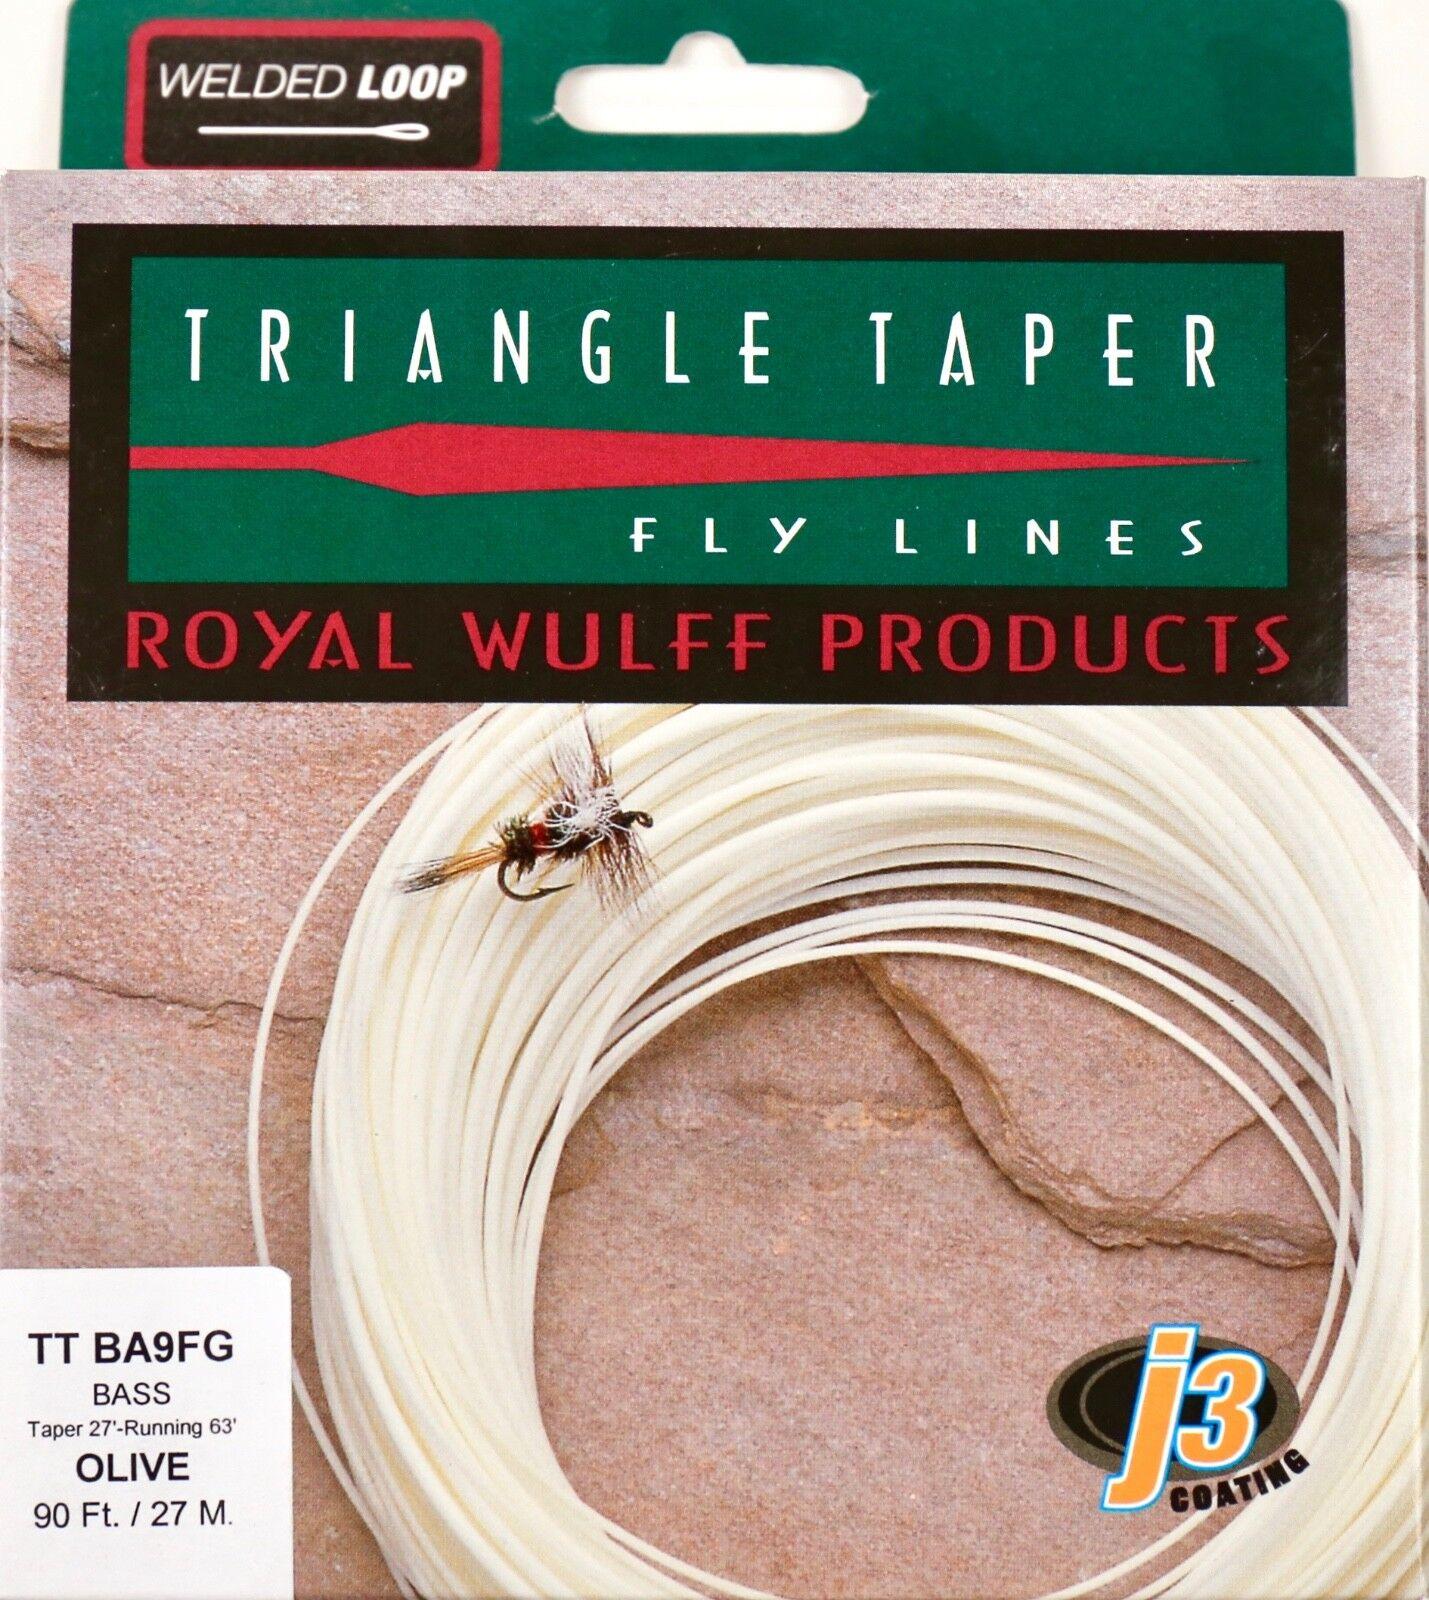 Royal Wulff Bass Triangle Taper 9 WT  Fly Line Olive Free Fast Shipping TTBA9FG  tiendas minoristas